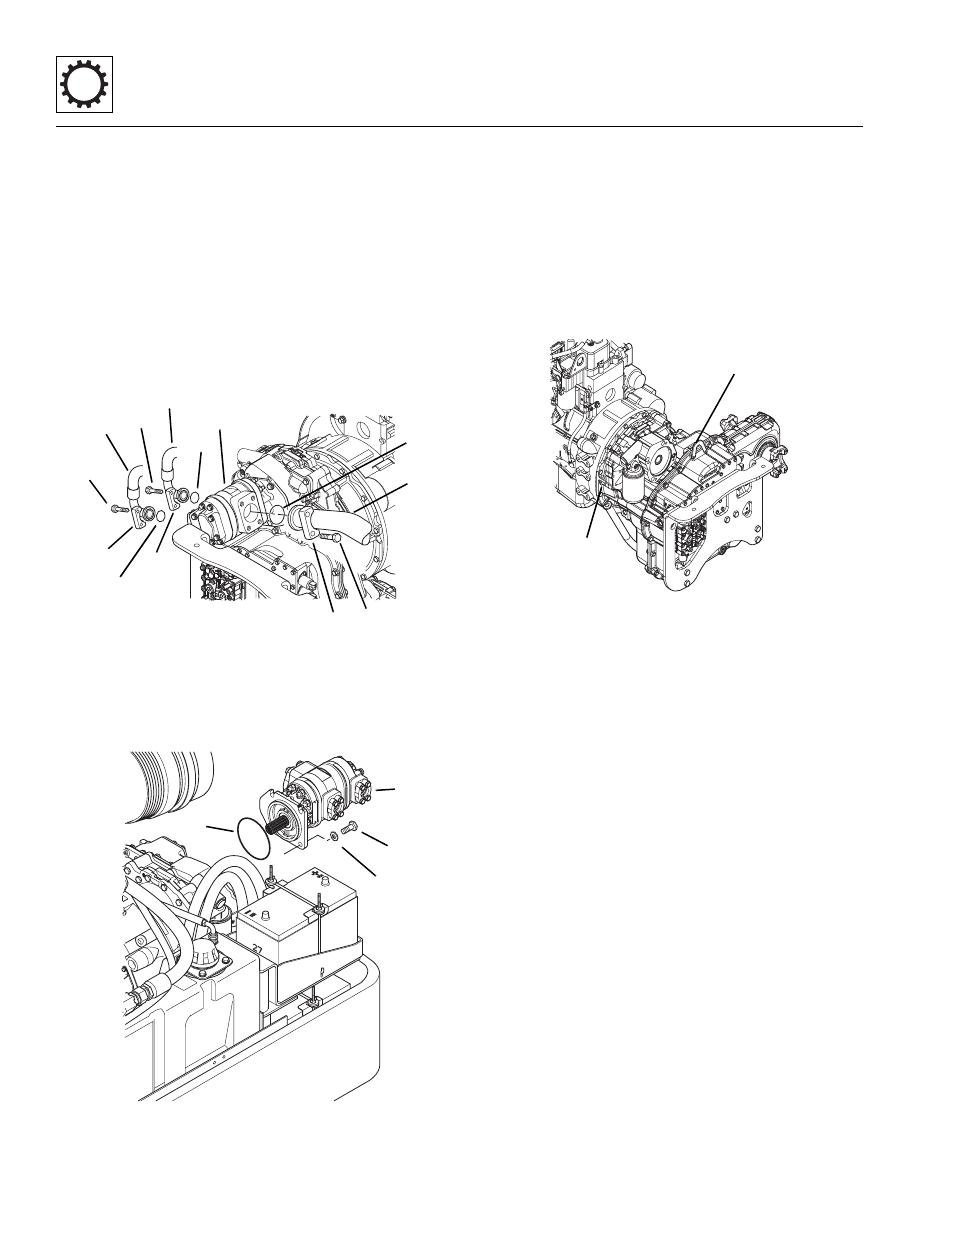 lull 944e 42 service manual user manual page 184 846 also for rh manualsdir com Lull 644 Parts lull 644b service manual